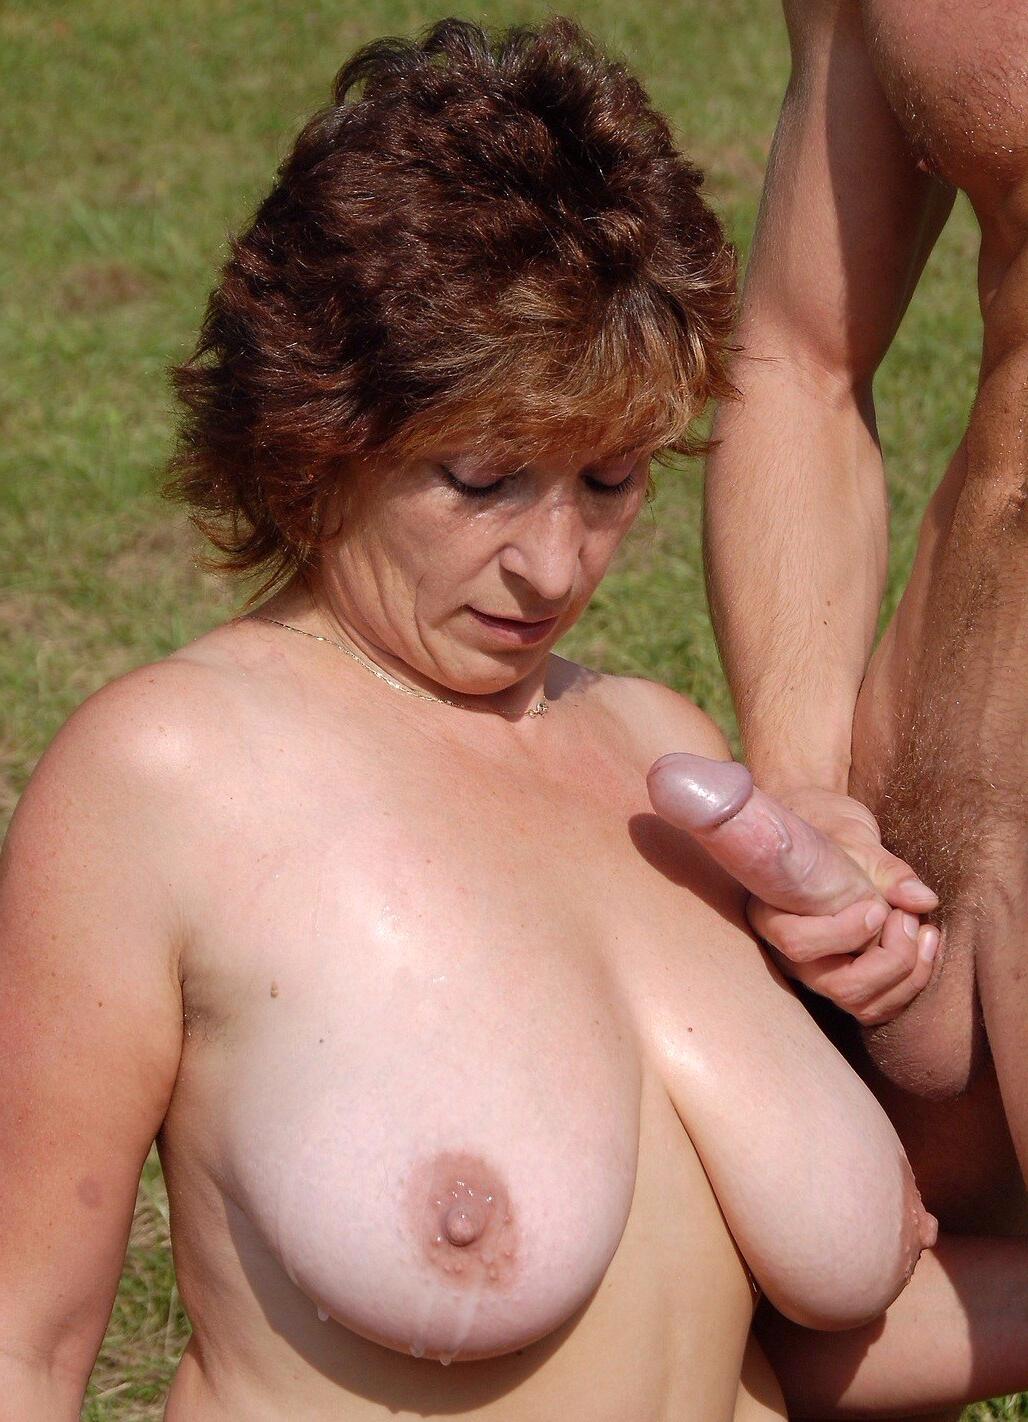 Naked Mature Blowjob Cumshot Photos Maturewomenpictures Net